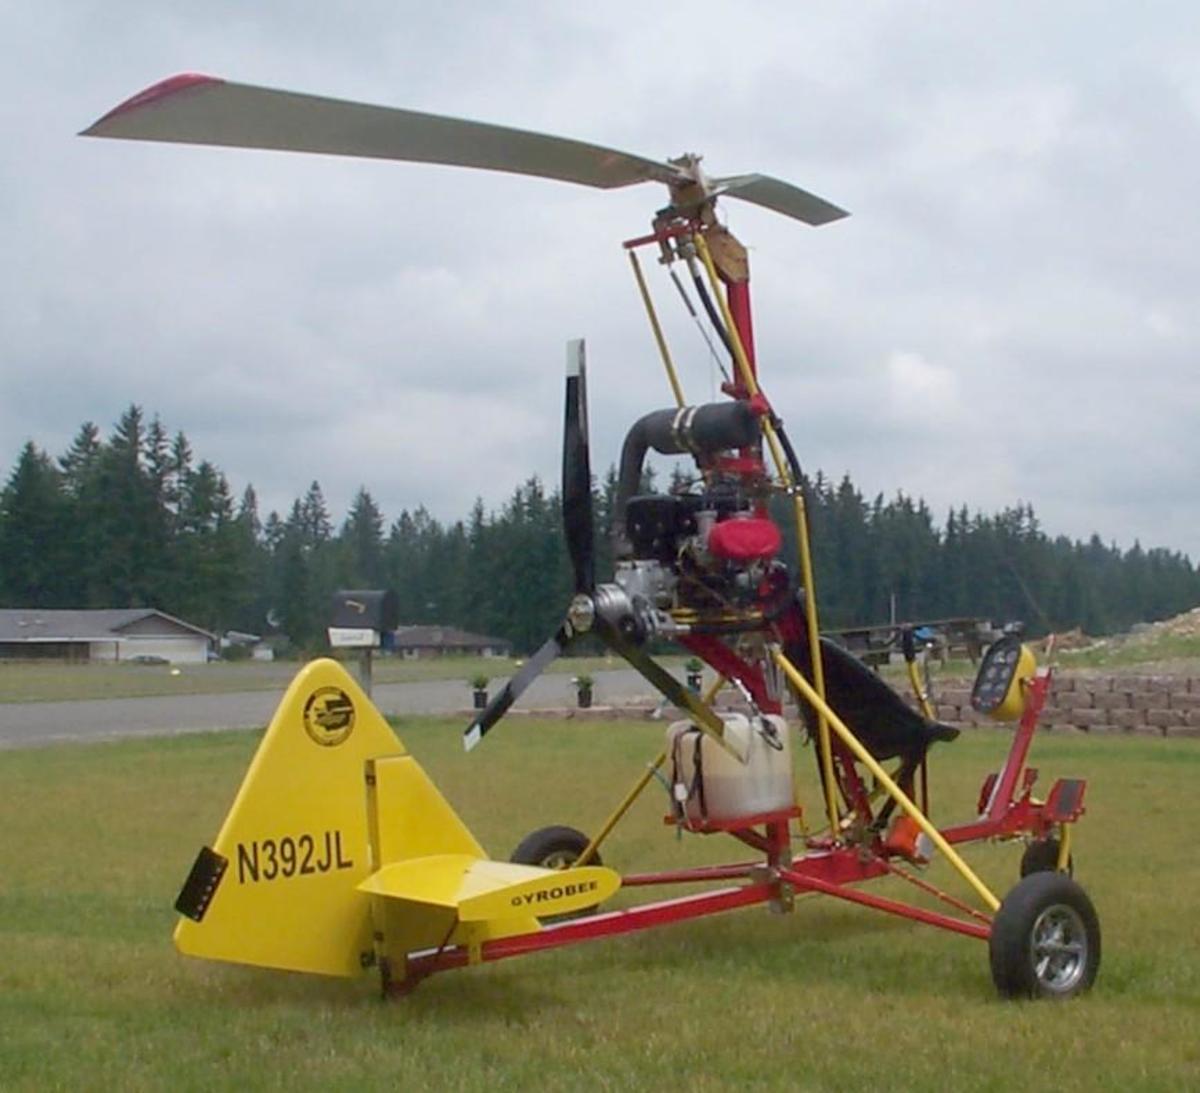 Far 103 legal ultralight gyrocopter